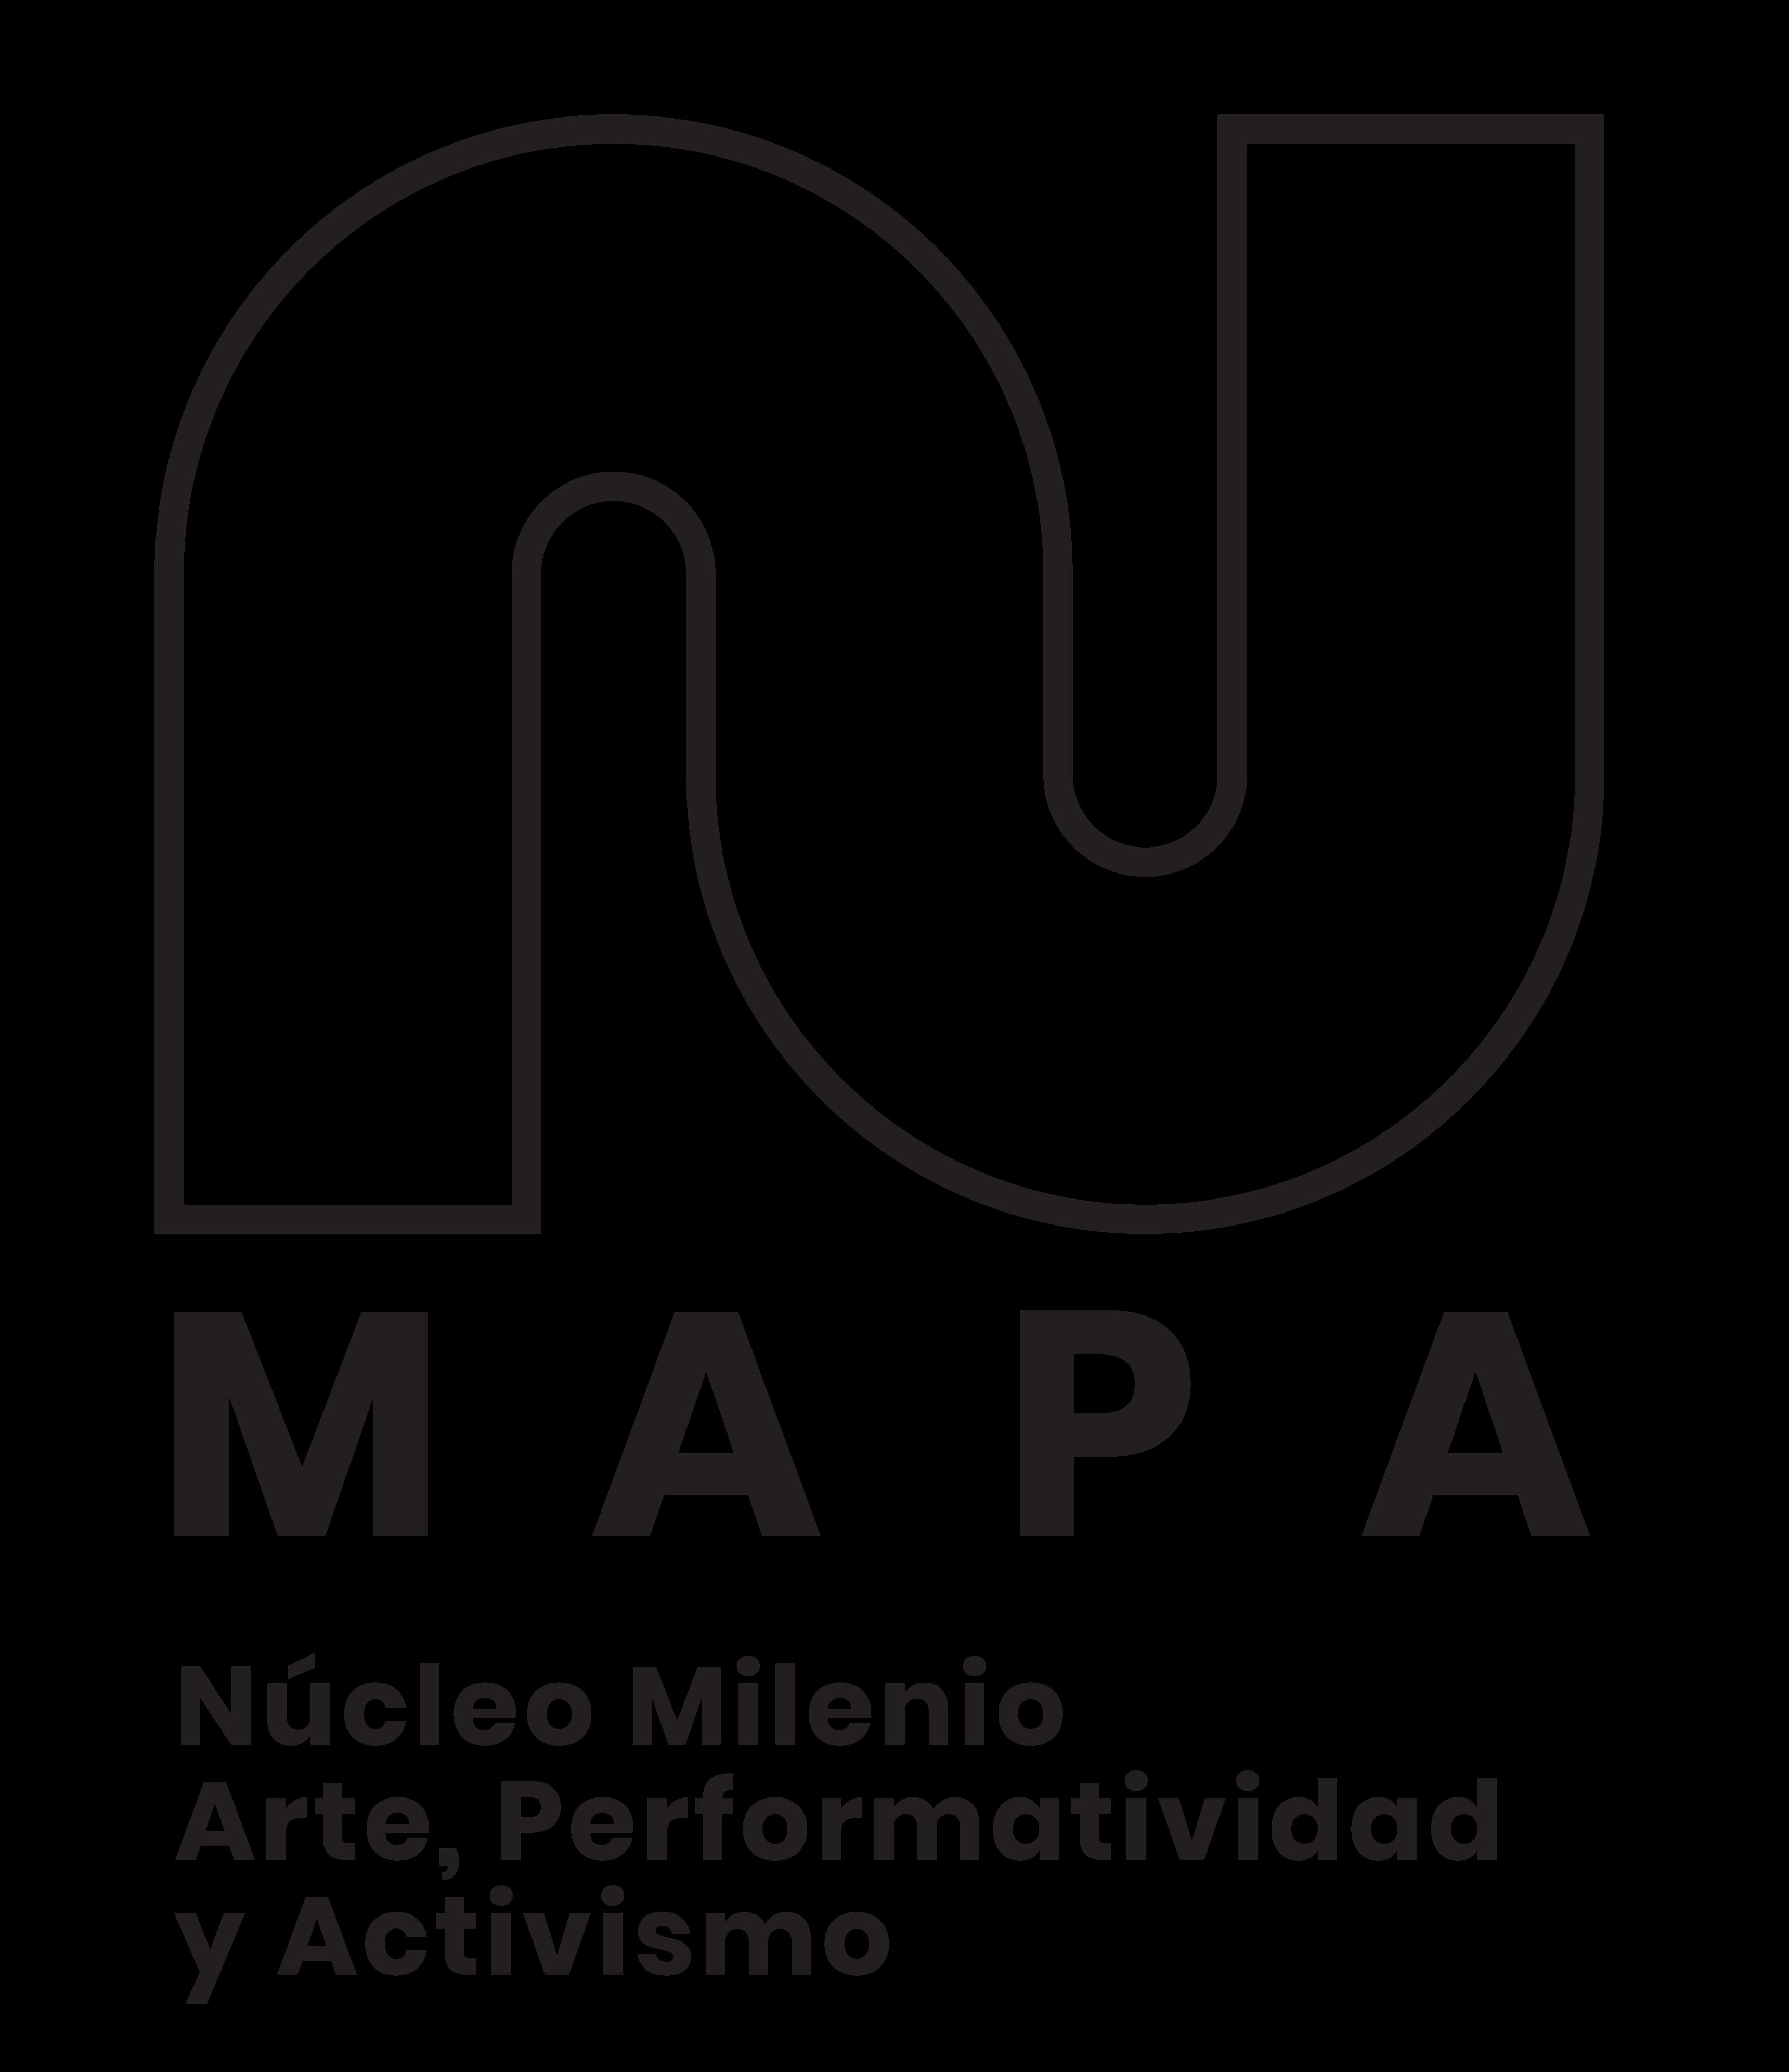 logoNmapa-02